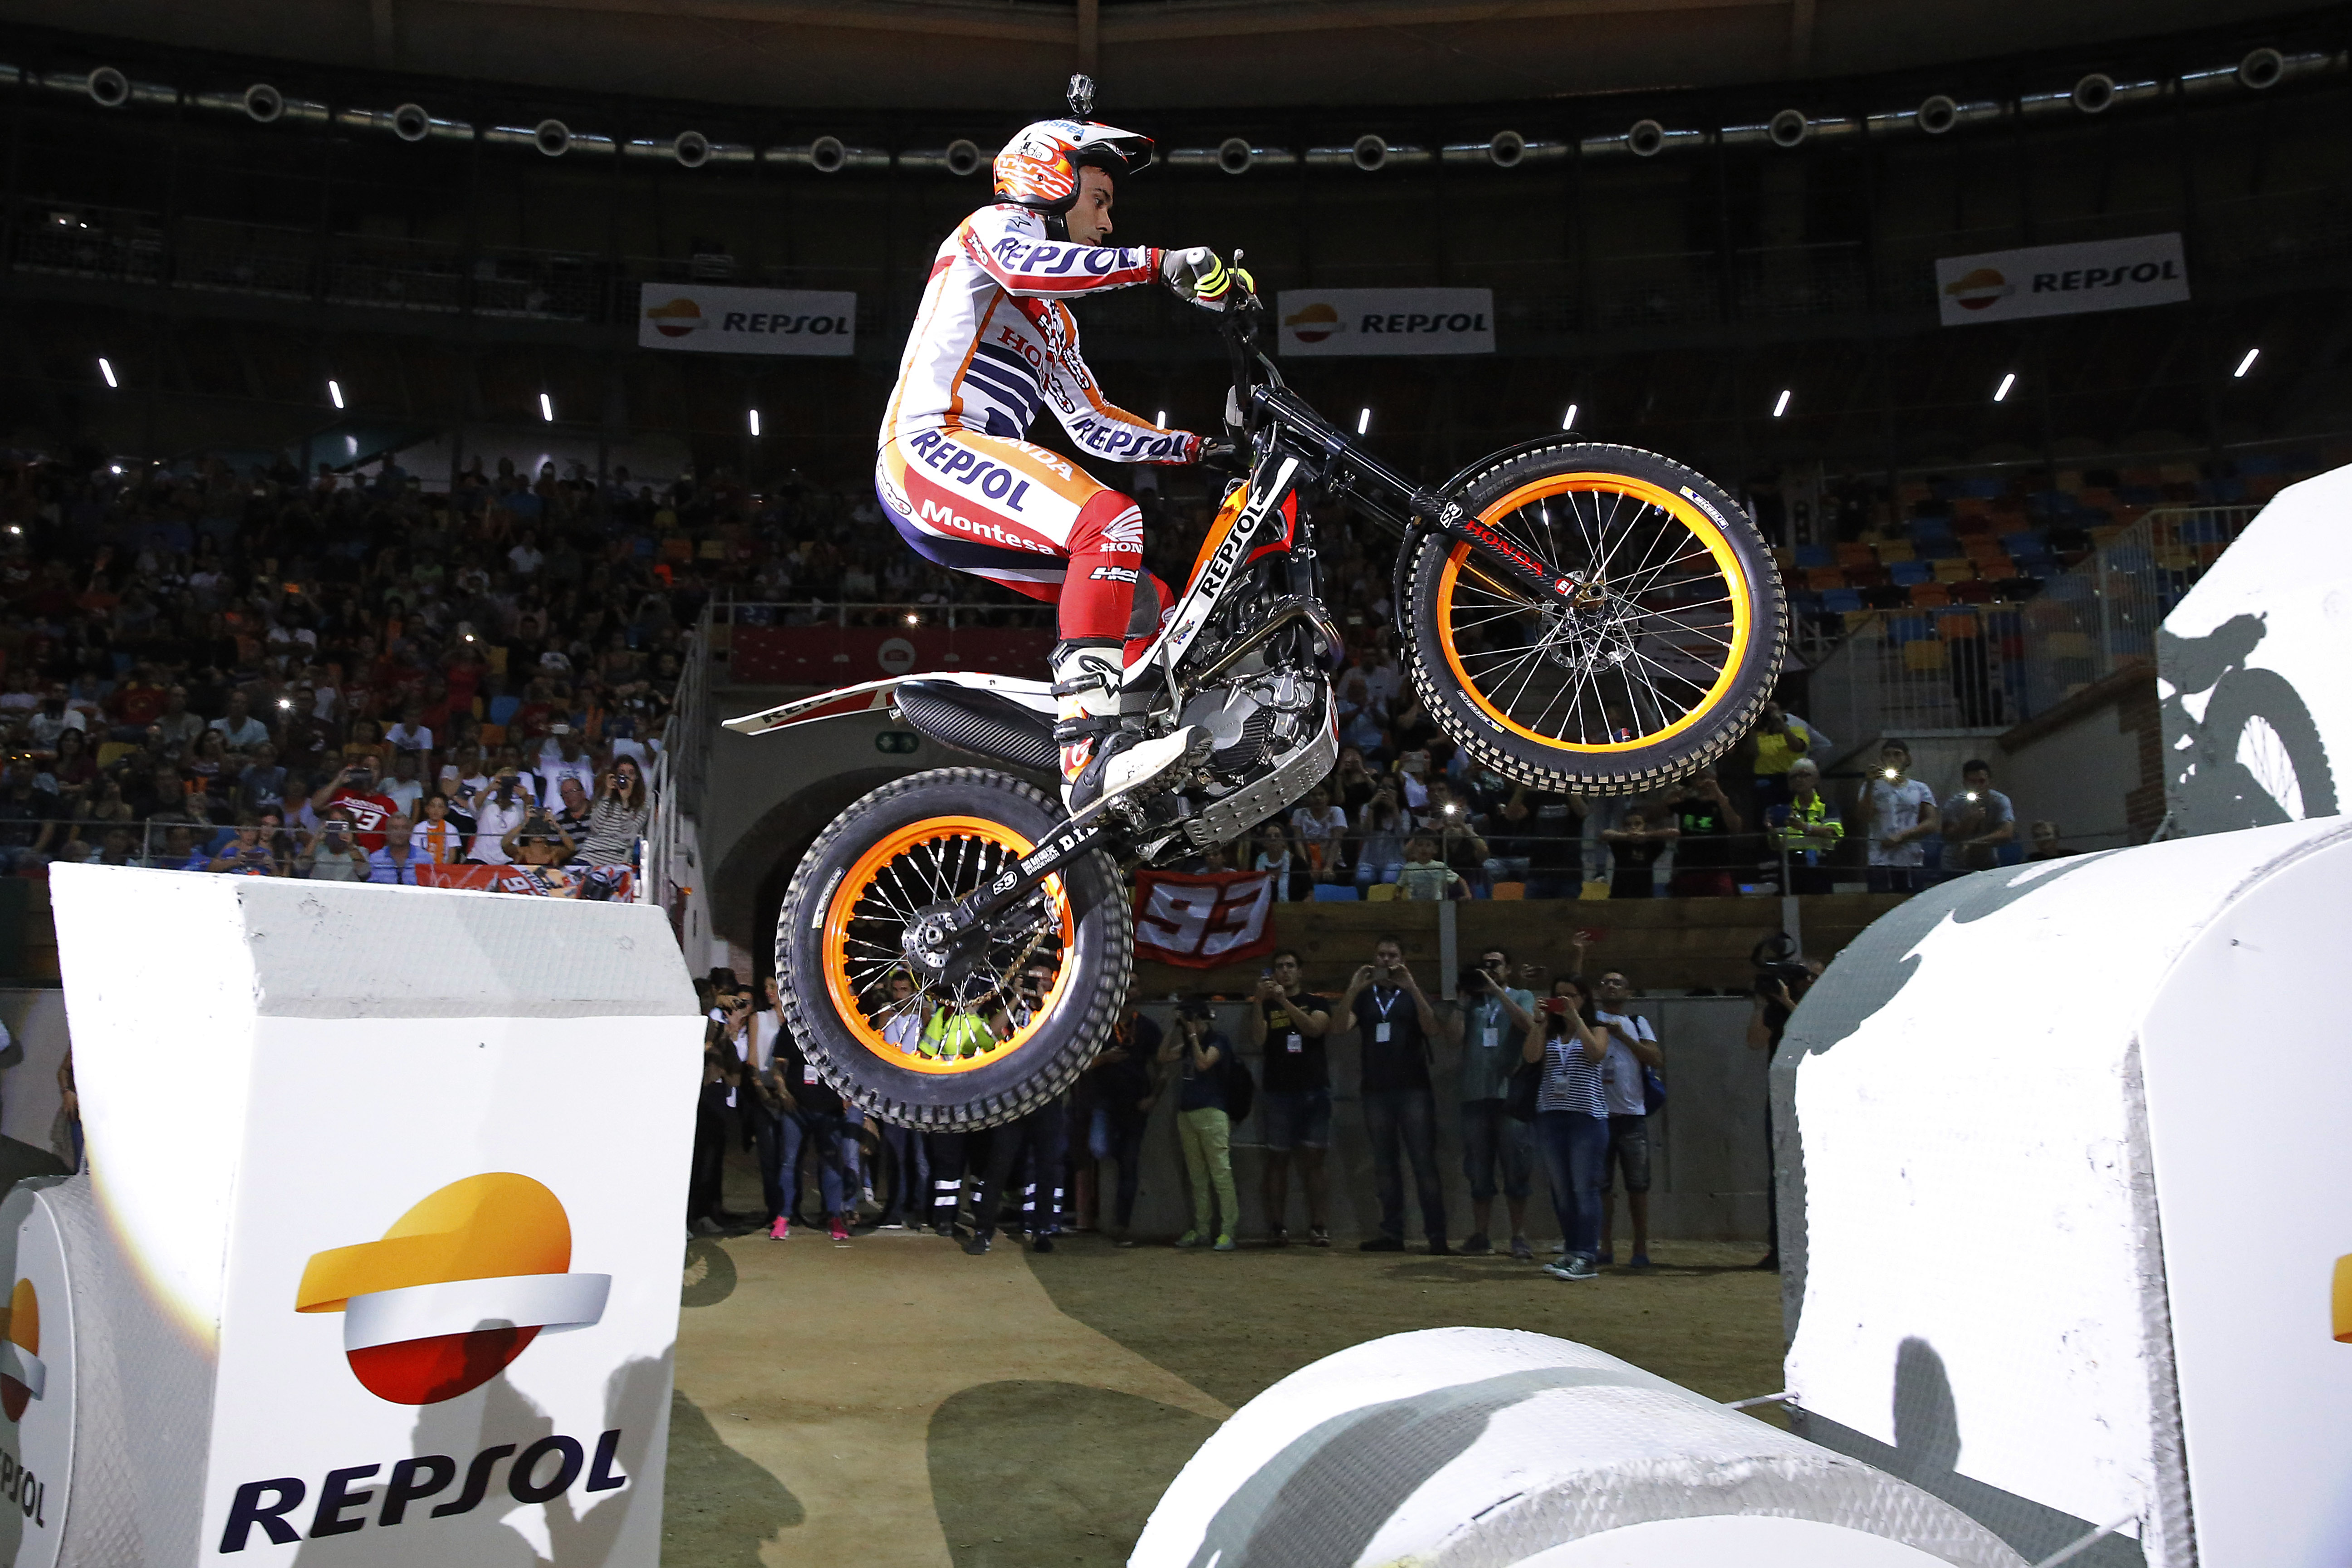 Toni Bou saltando con su Honda Montesa